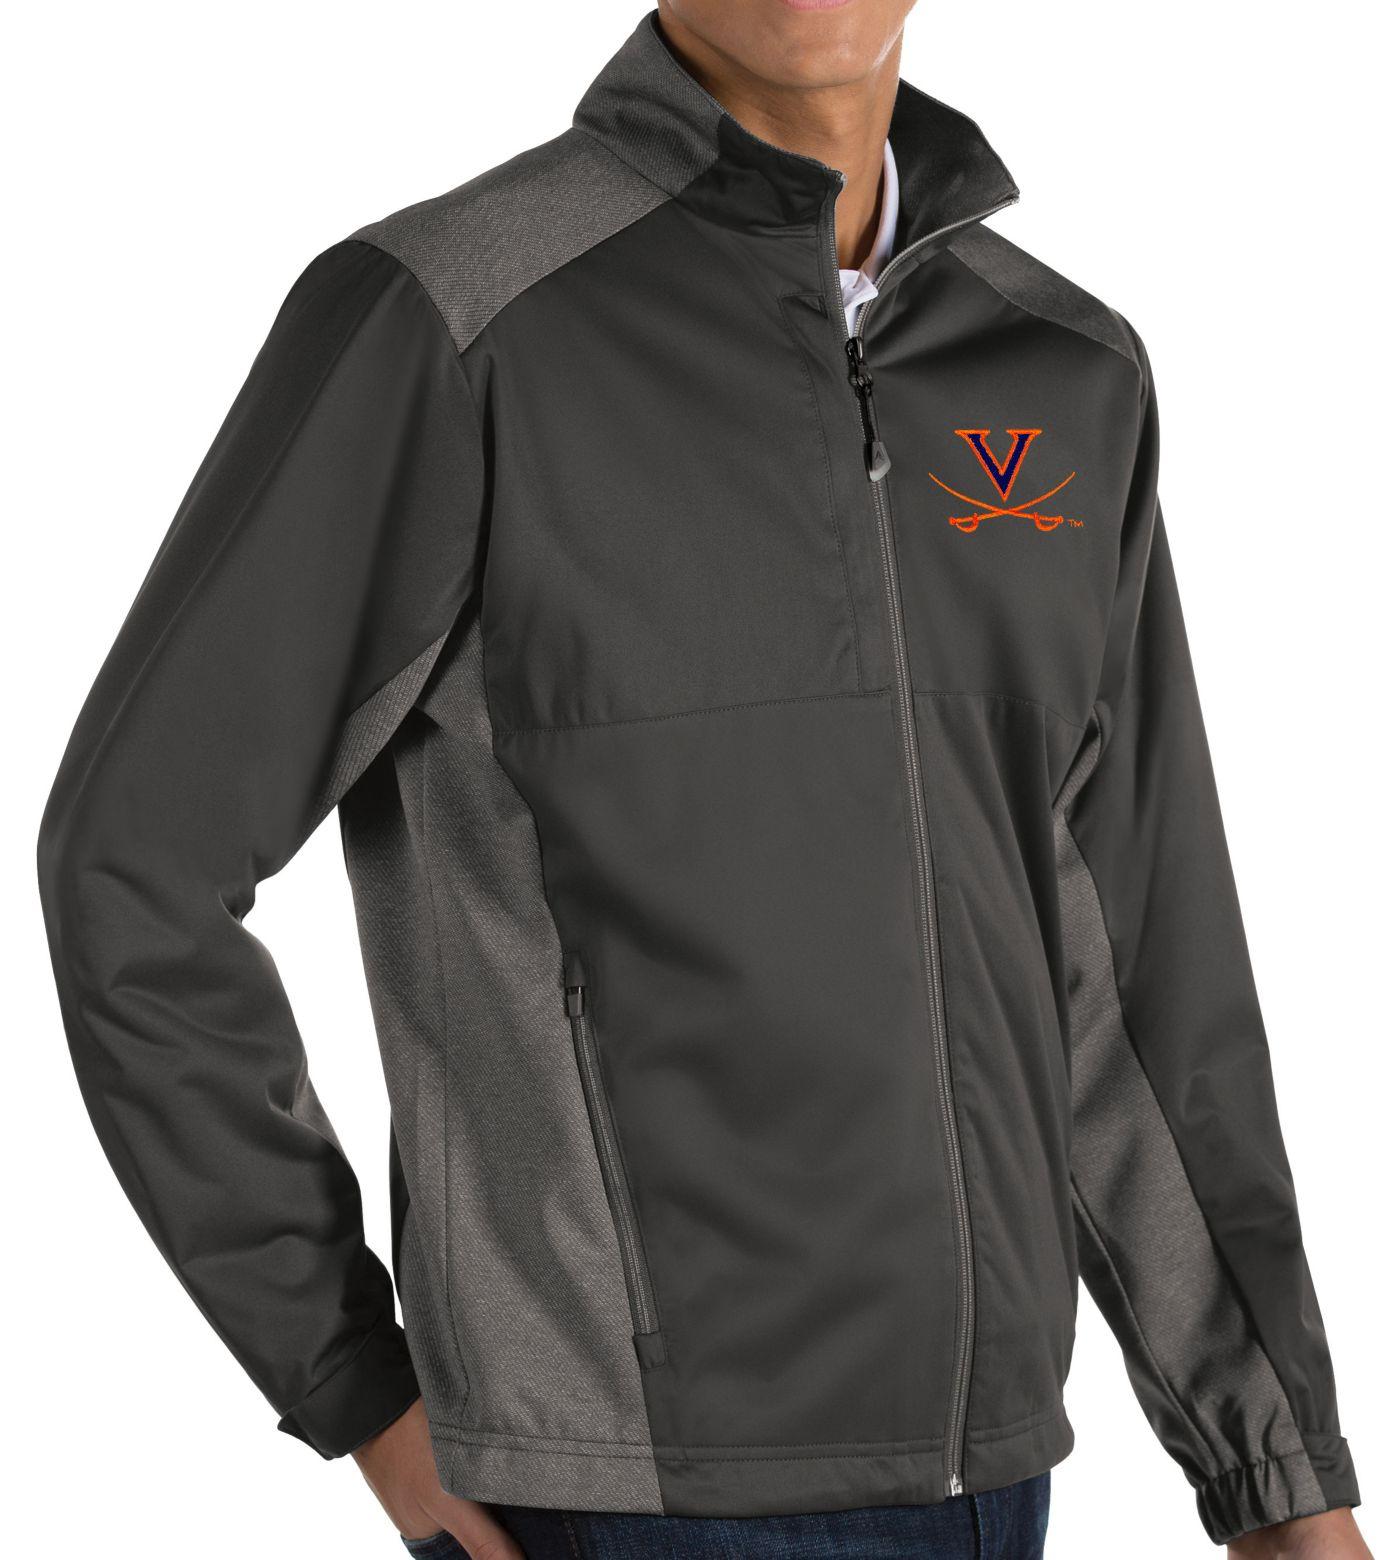 Antigua Men's Virginia Cavaliers Grey Revolve Full-Zip Jacket